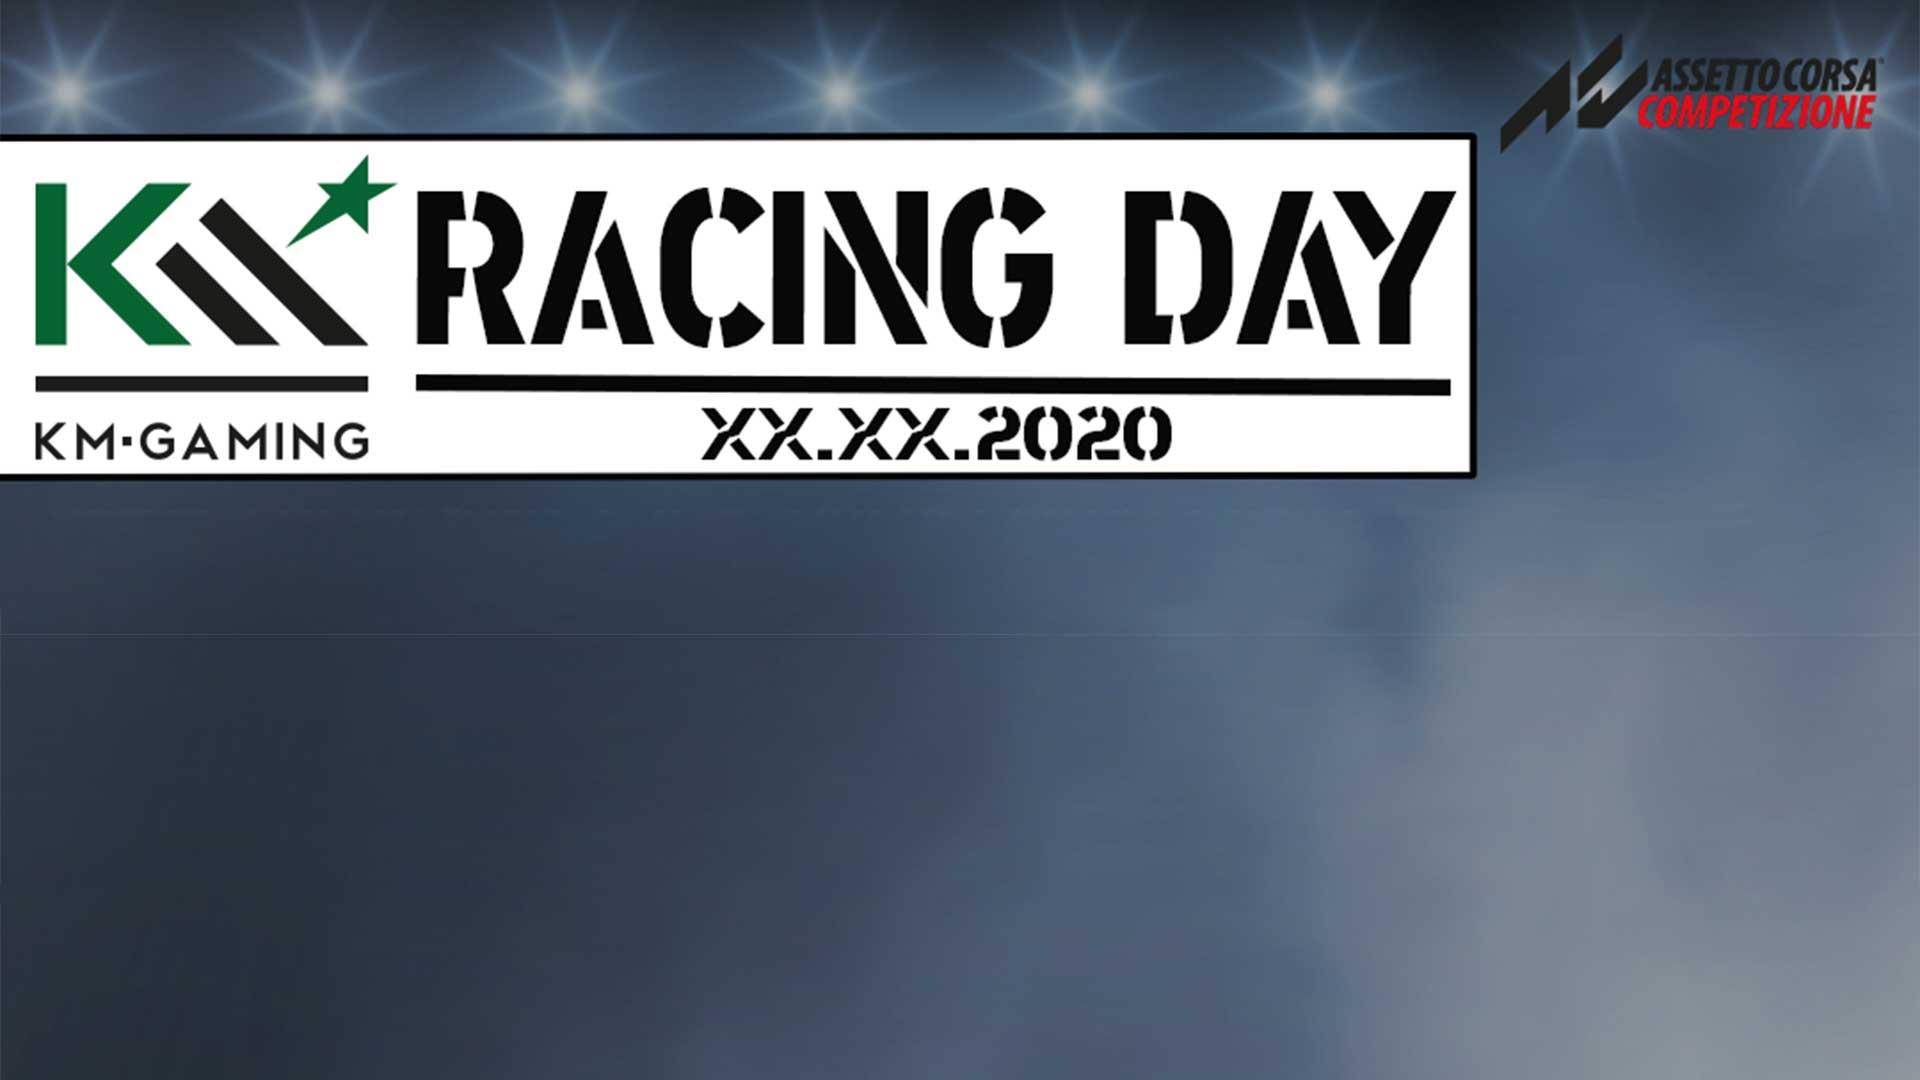 km racing day